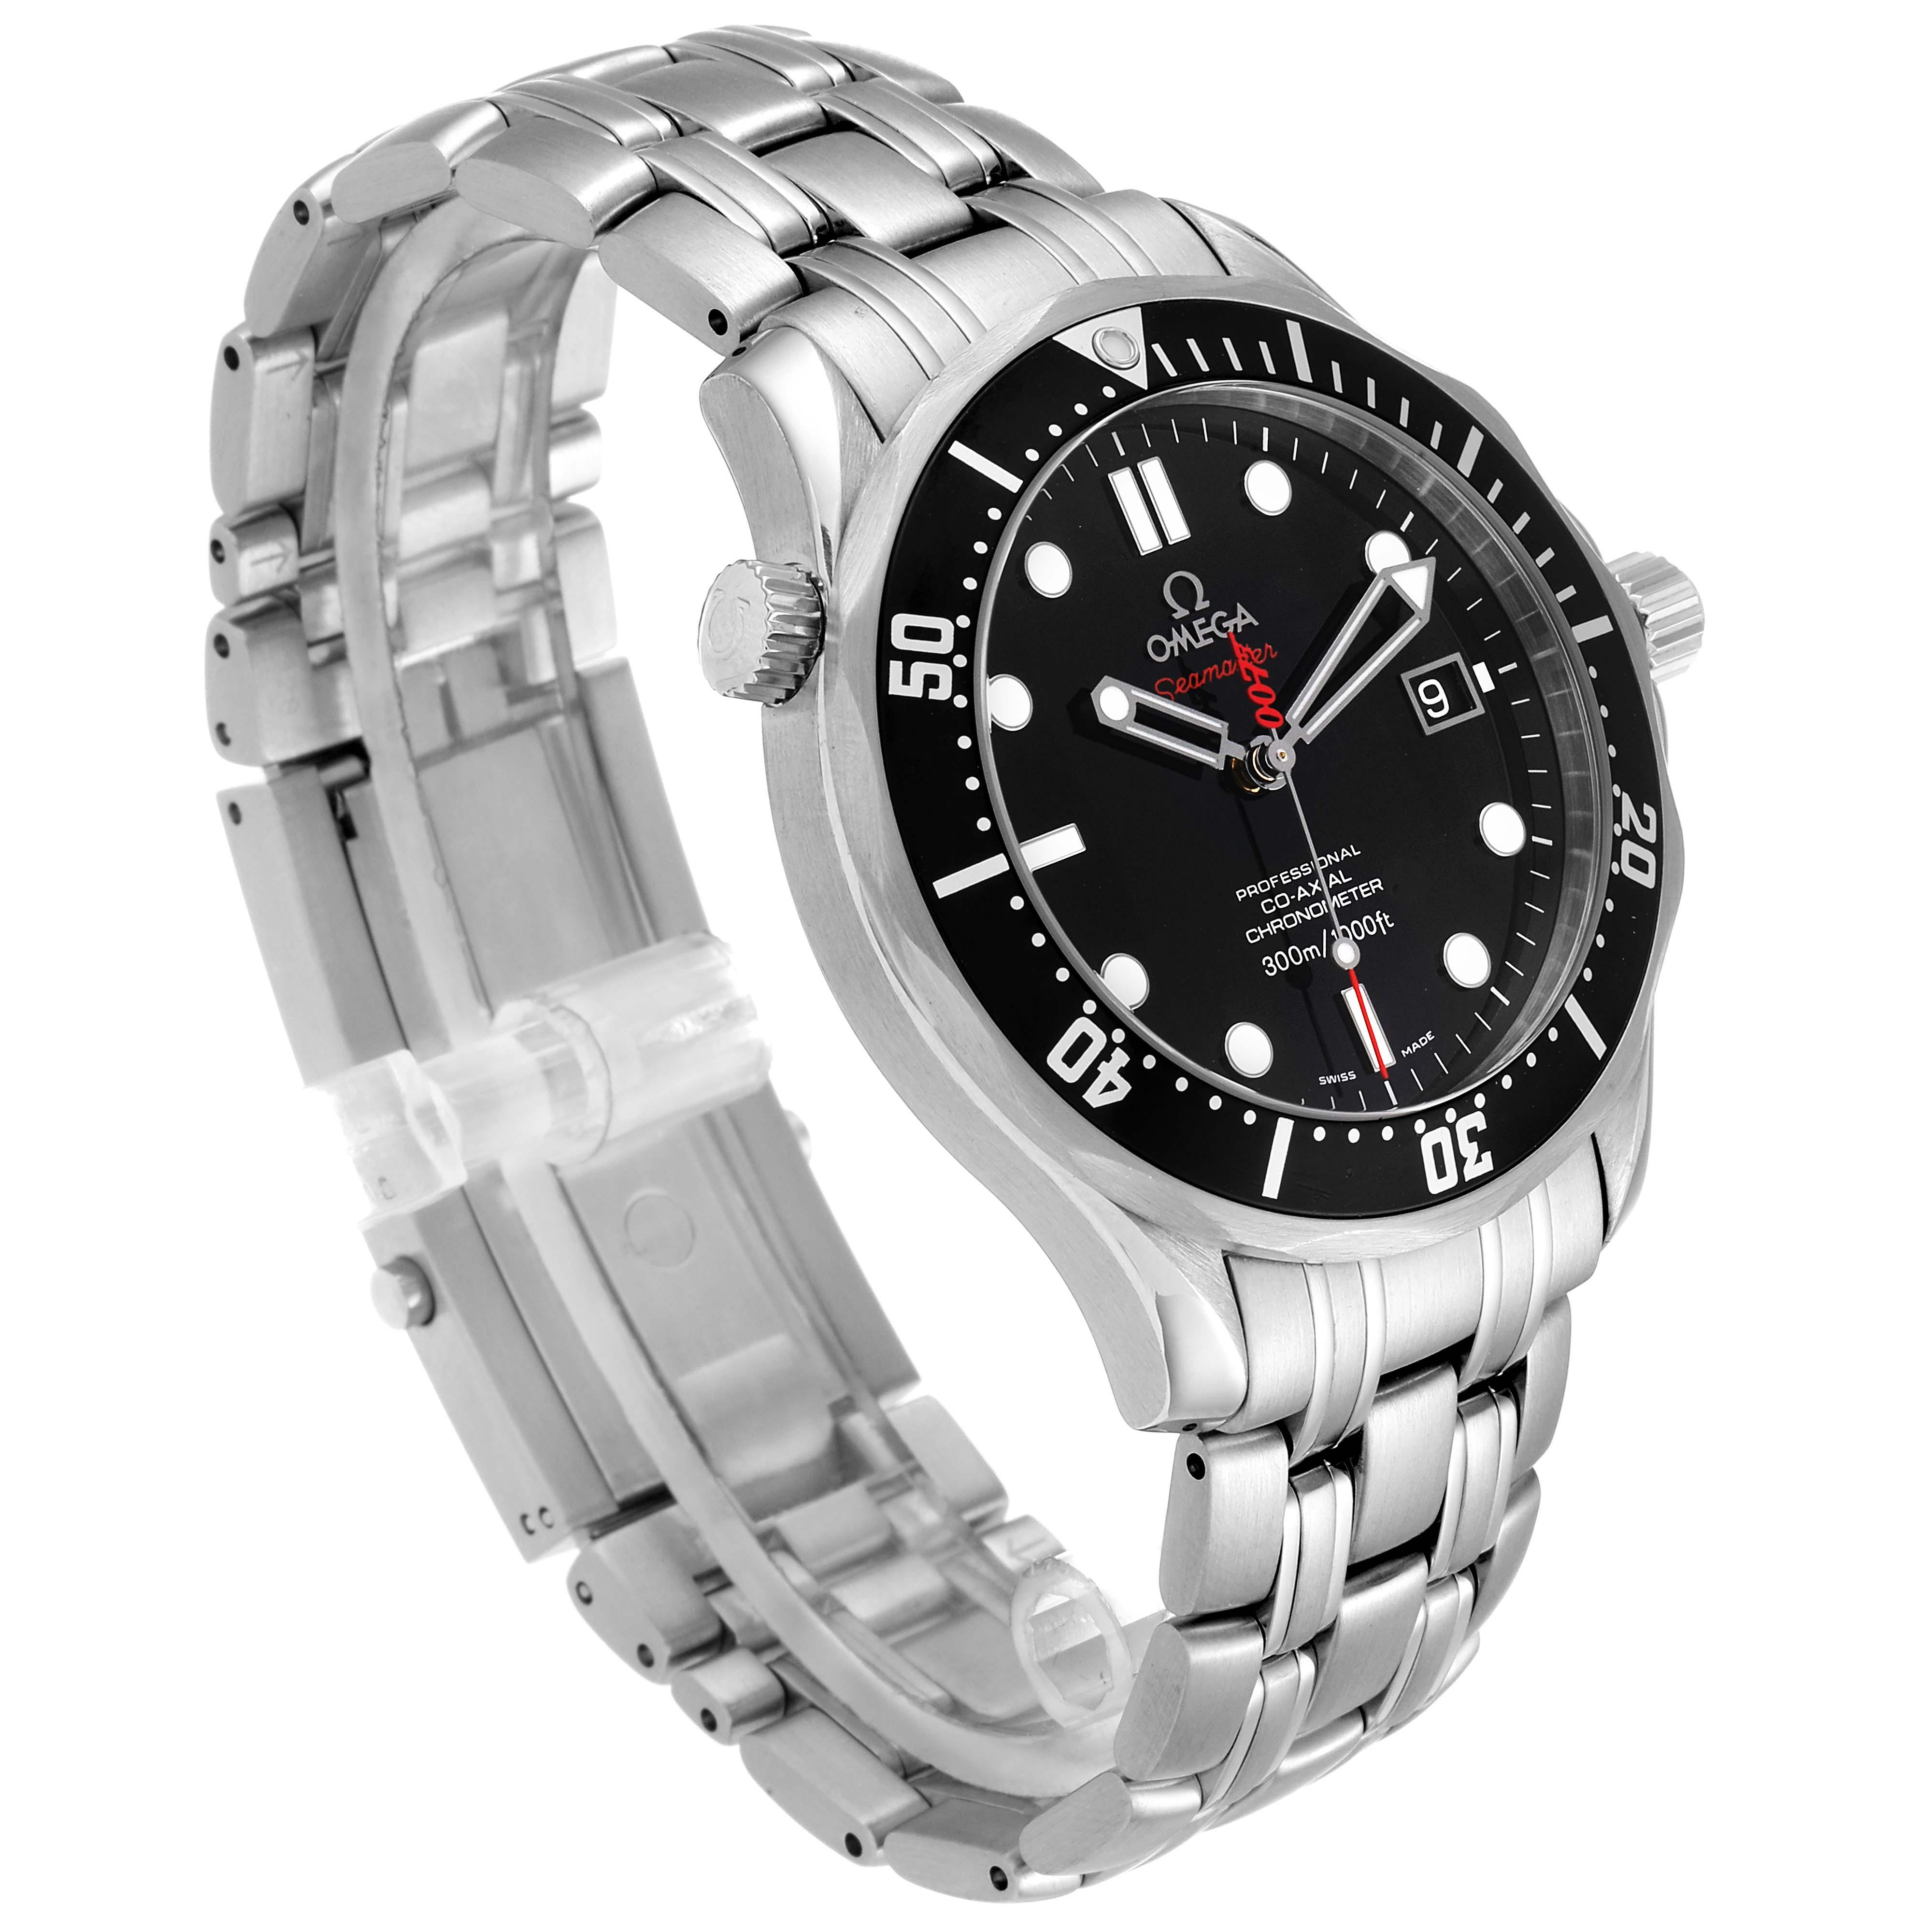 Omega Seamaster Bond 007 Limited Edition Watch 212.30.41.20.01.001 SwissWatchExpo